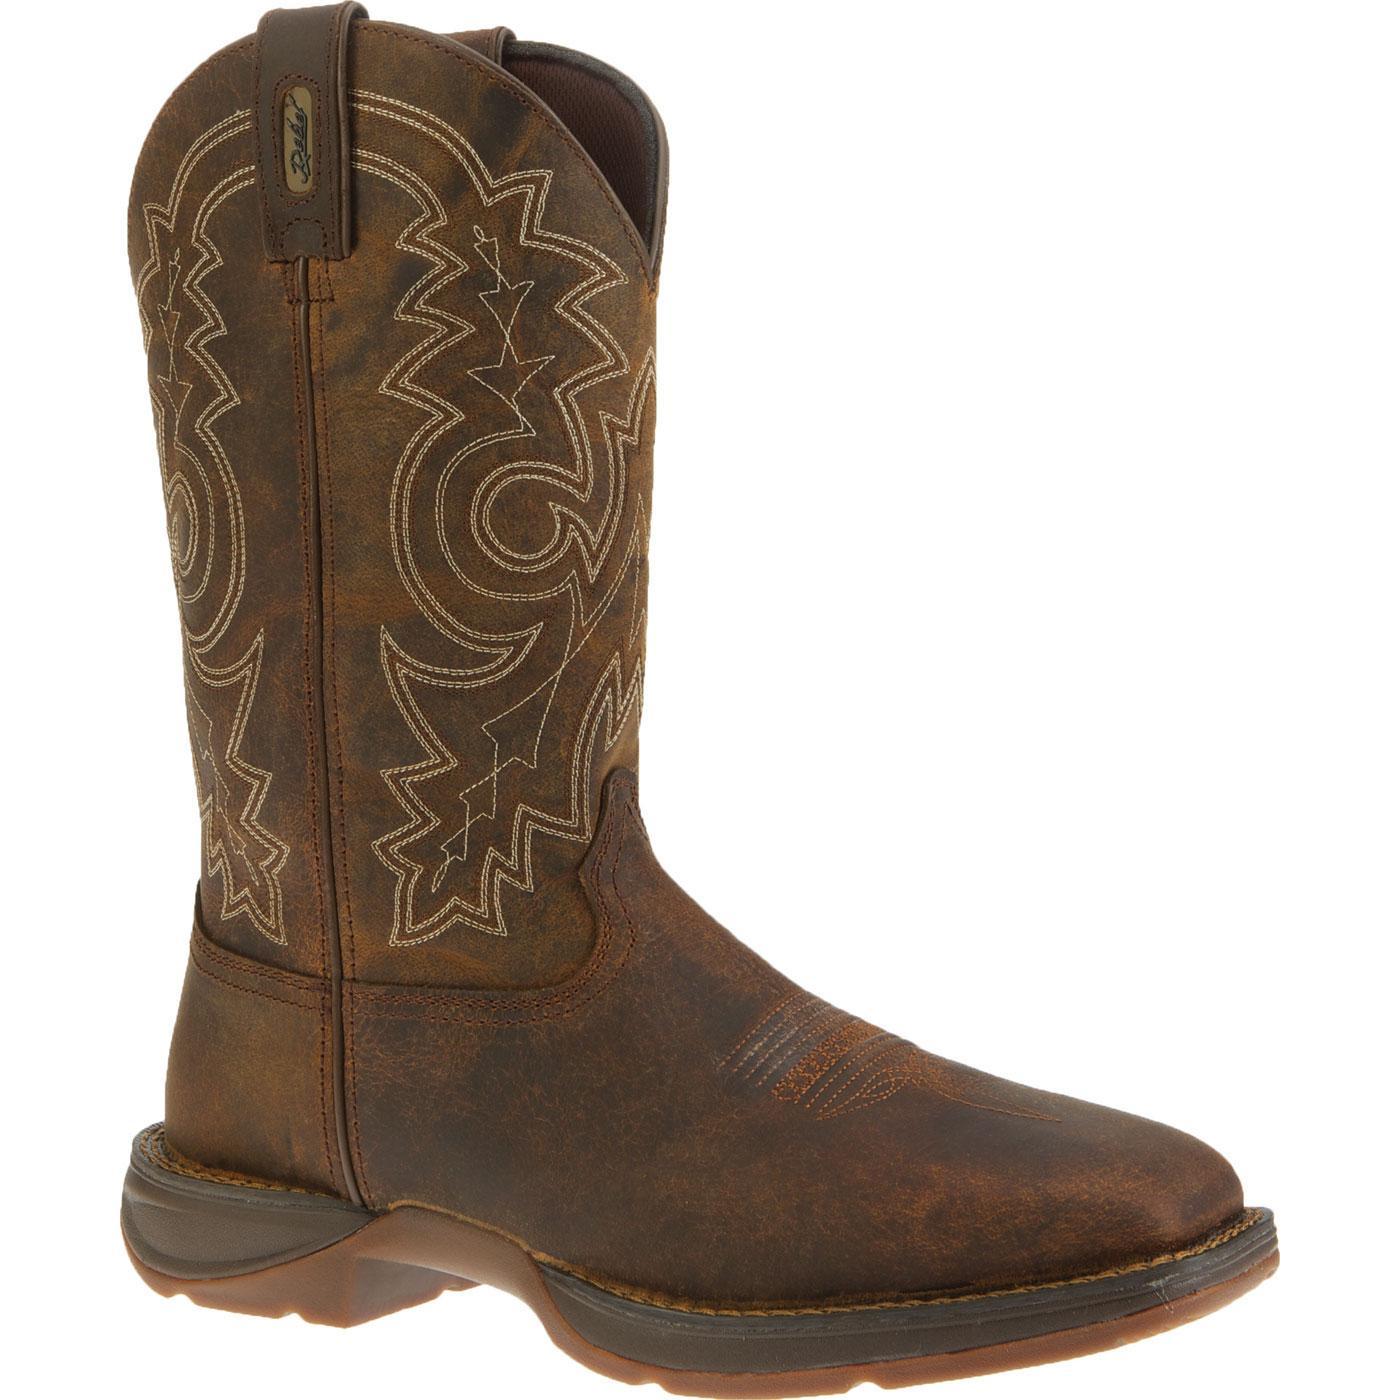 Durango - Rebel Steel Toe EH Cowboy Work Boots-Durango